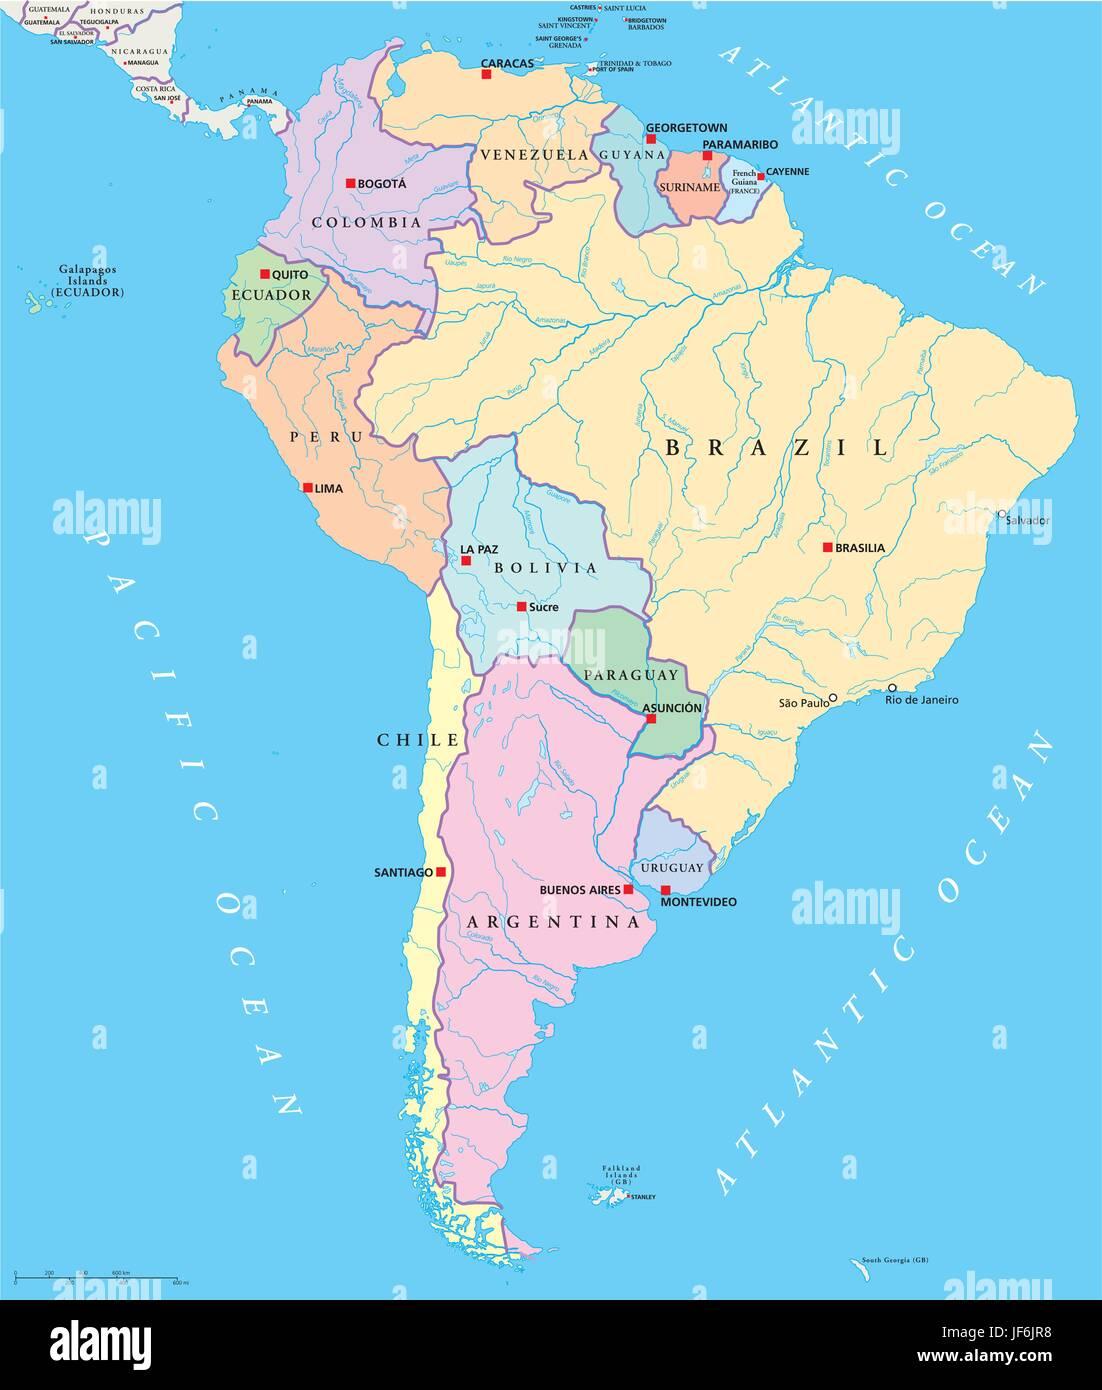 Politische Amerika Sudamerika Kontinent Staaten Karte Atlas